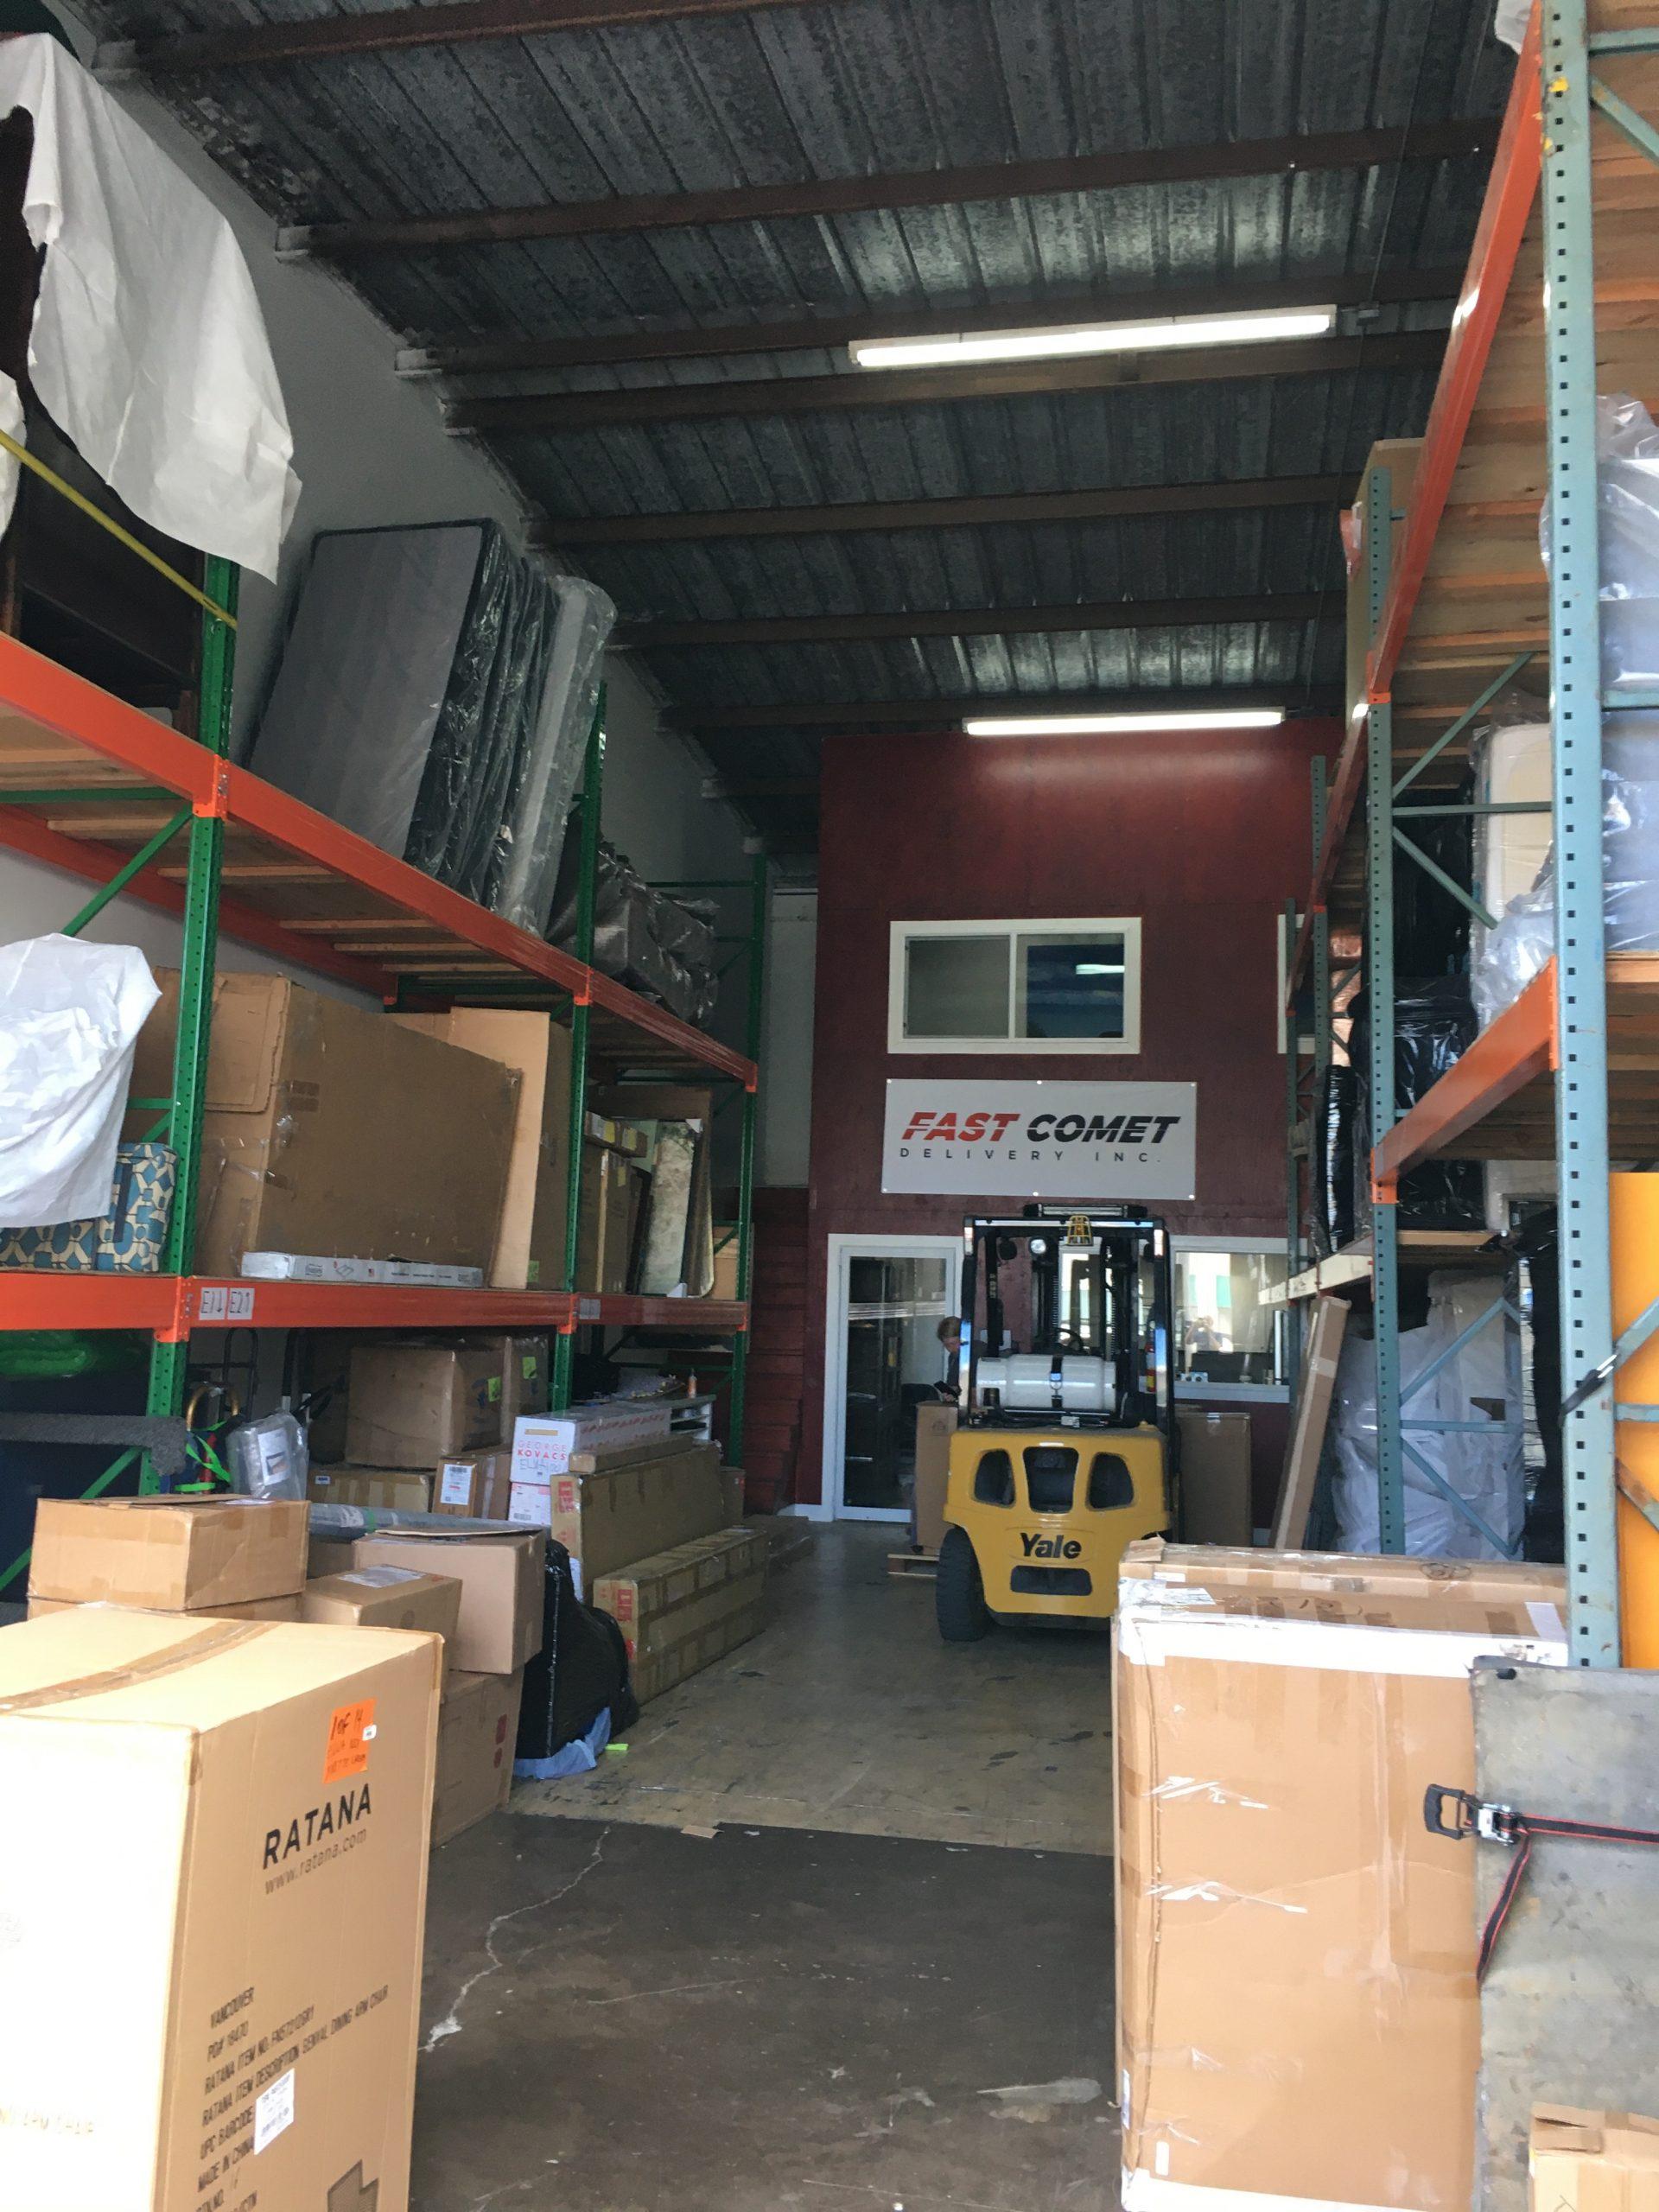 Fast Comet Warehouse 2 -Maui Hawaii - Movers